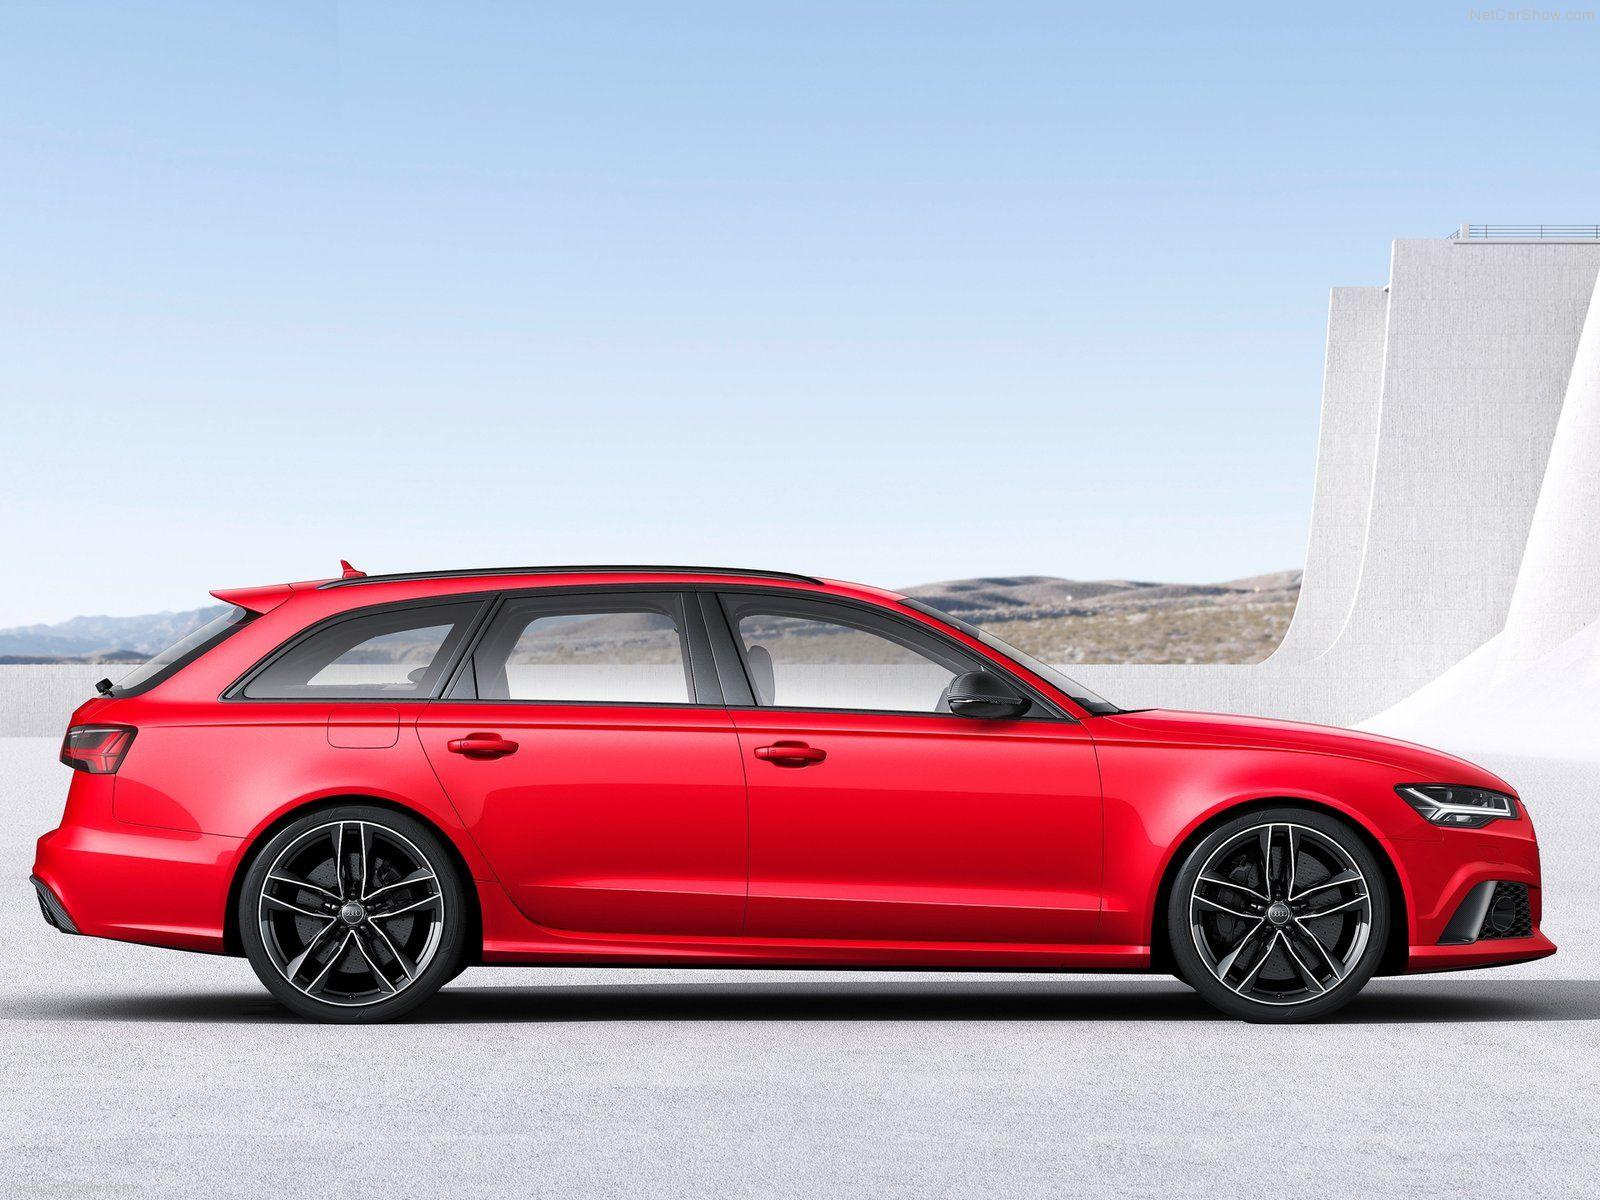 2015 Audi RS6 Avant Cars & Motorcycles Pinterest